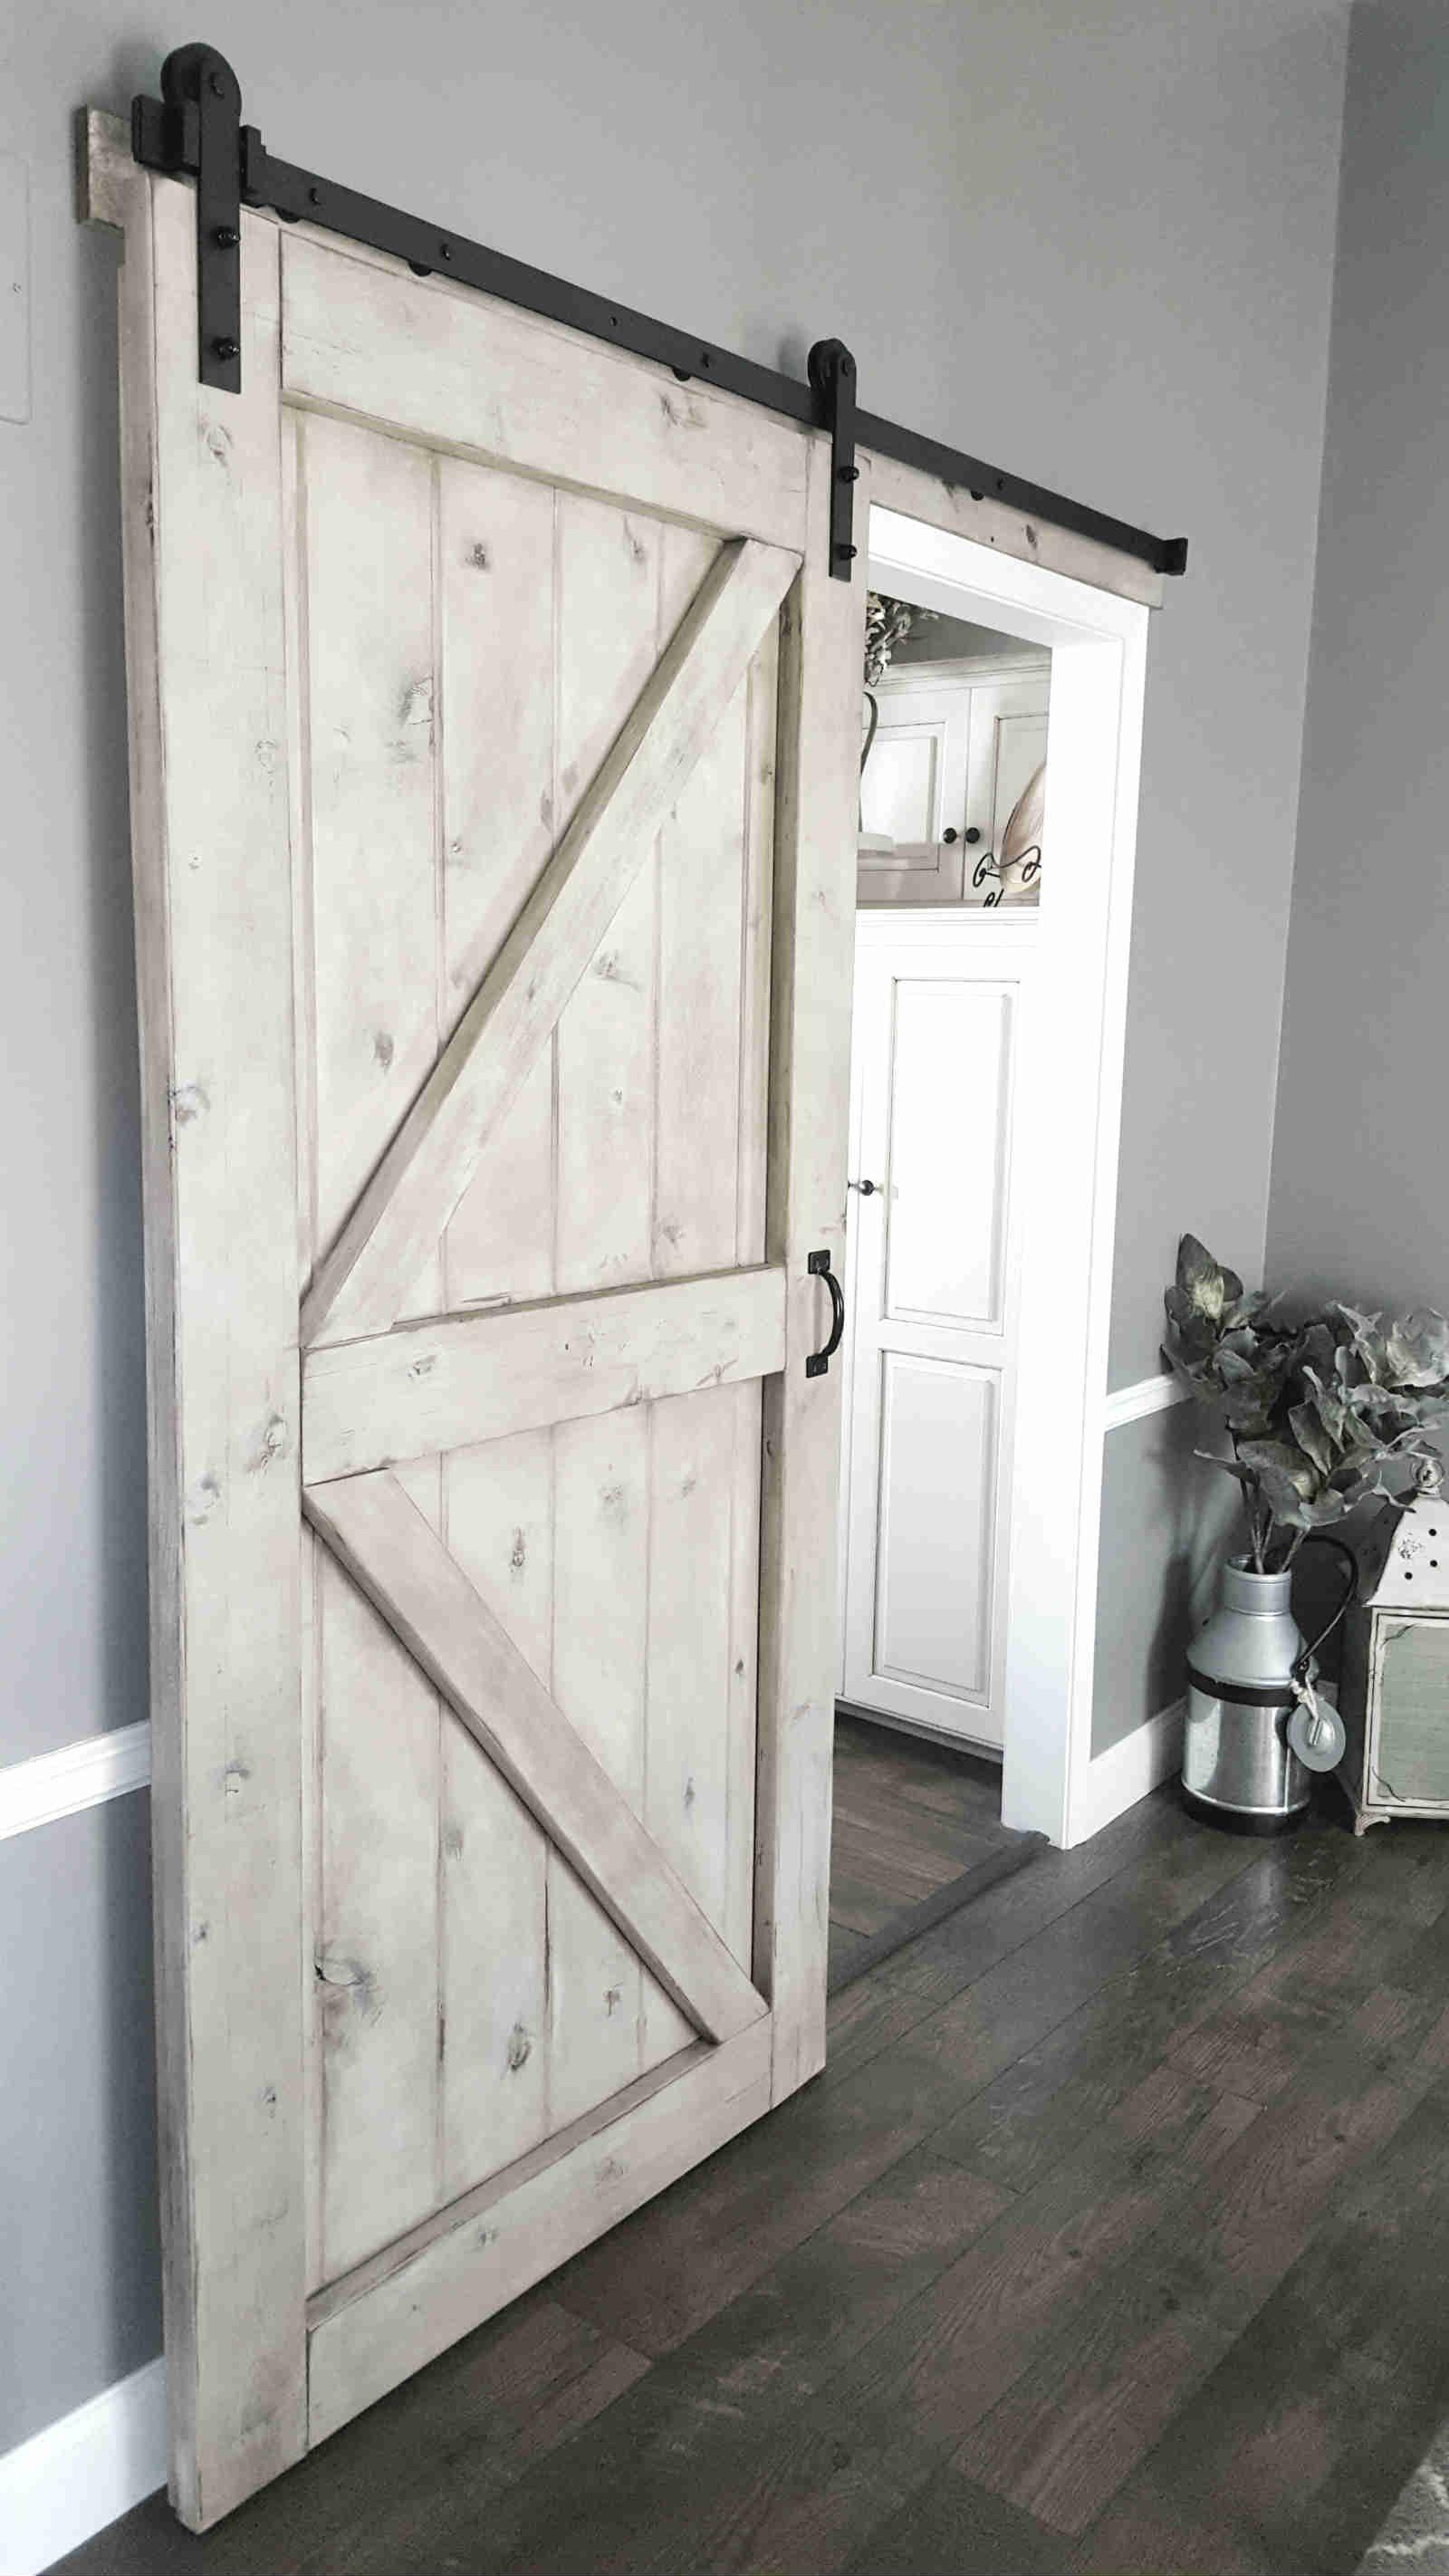 Gray Wash Barn Door Sliding 2 Panel Z Style Barn Doors Sliding Barn Door Closet Interior Sliding Barn Doors